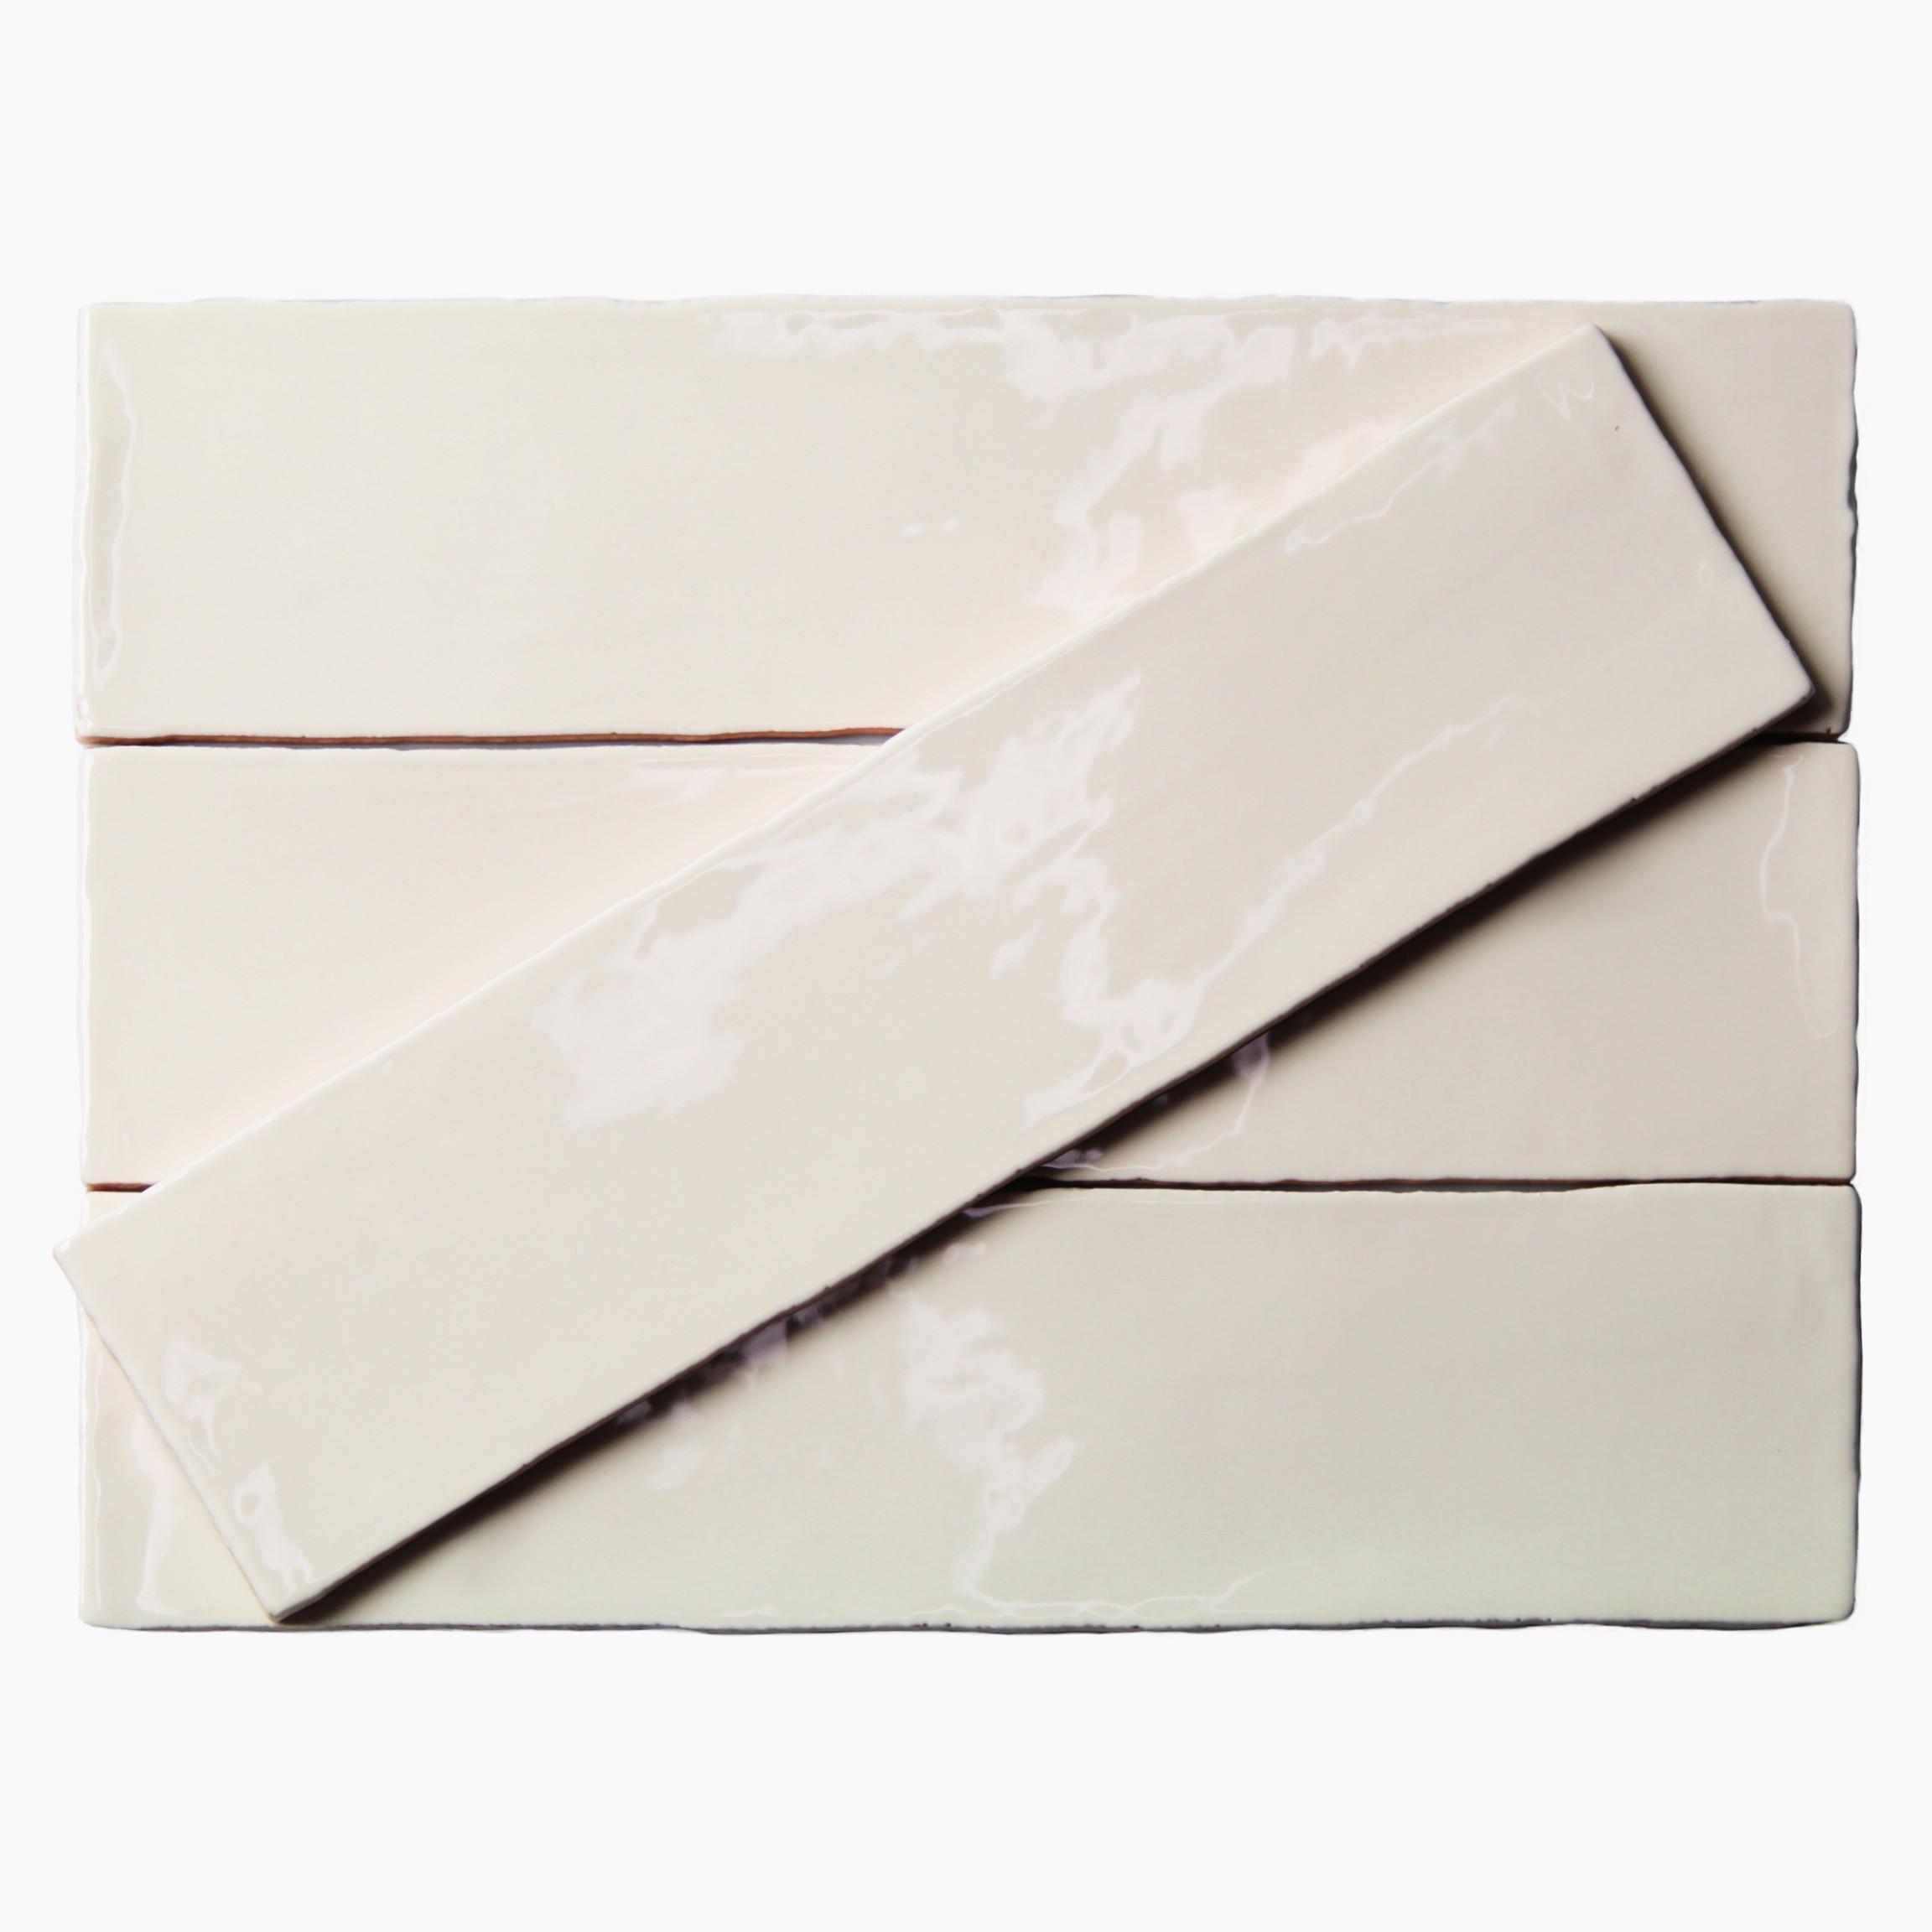 Shop For Lancaster 3x12 Vanilla Ceramic Tile At Tilebar Com